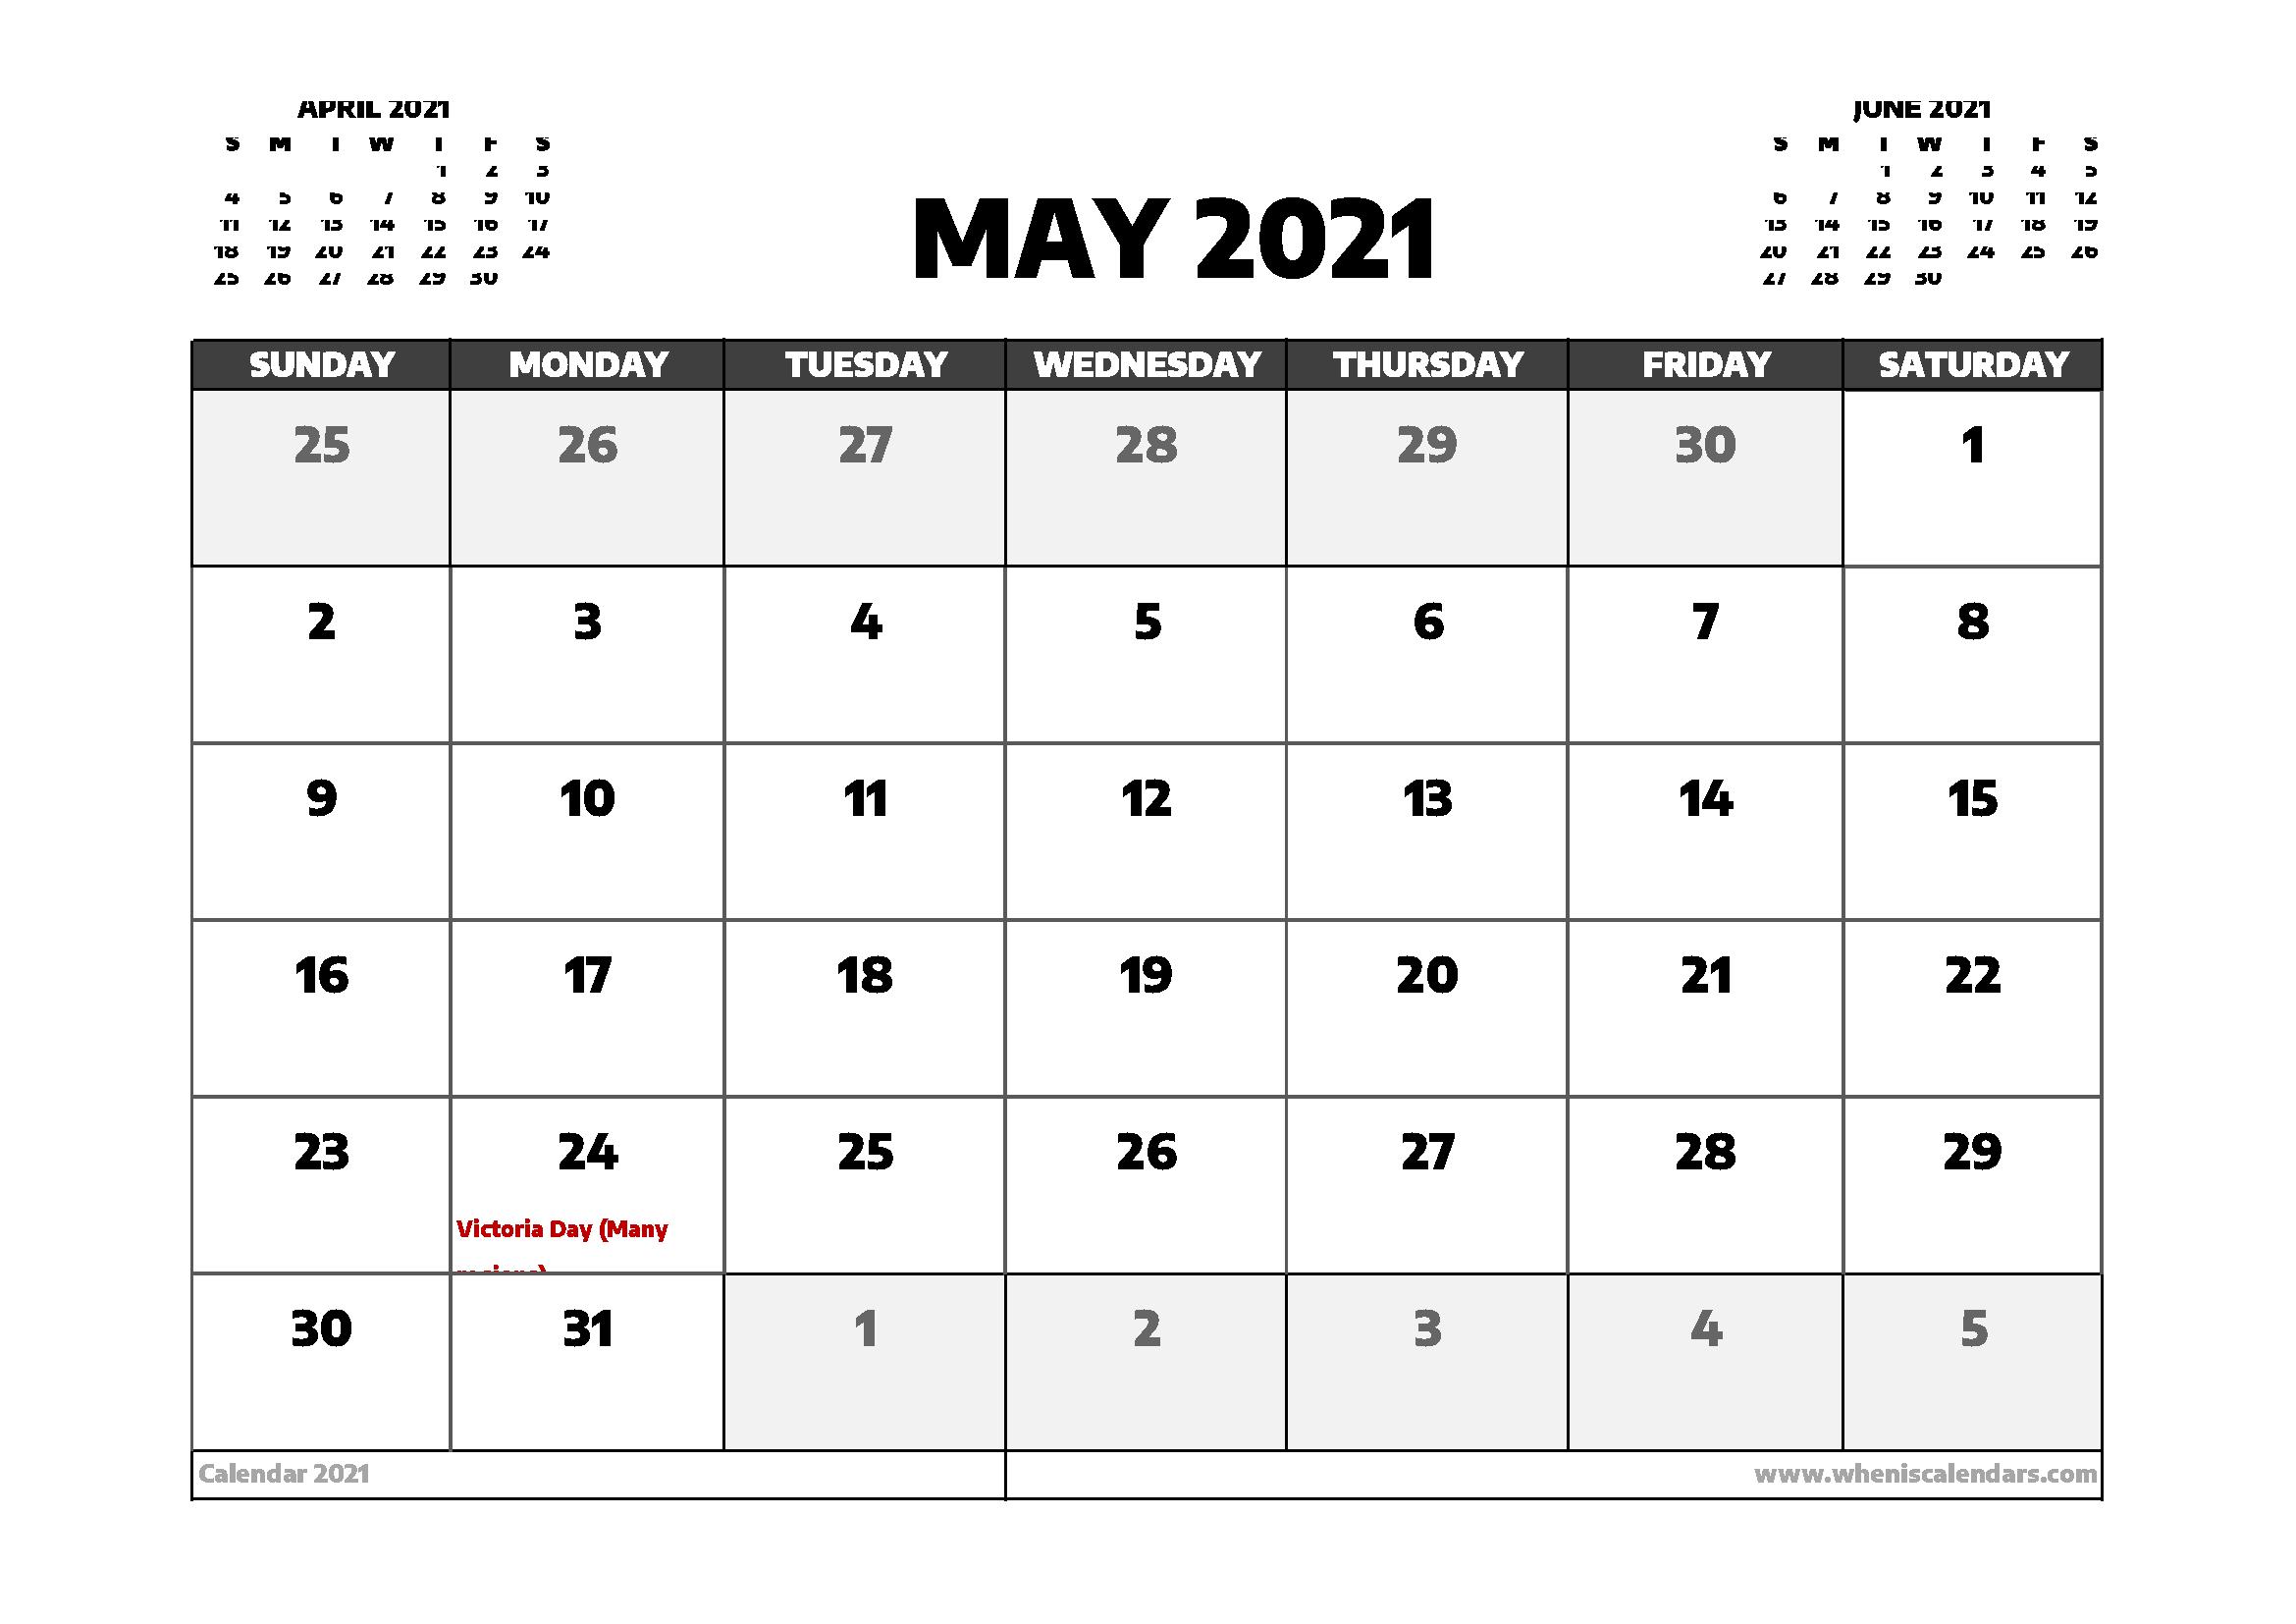 May 2021 Calendar Canada with Holidays - Free Printable ...